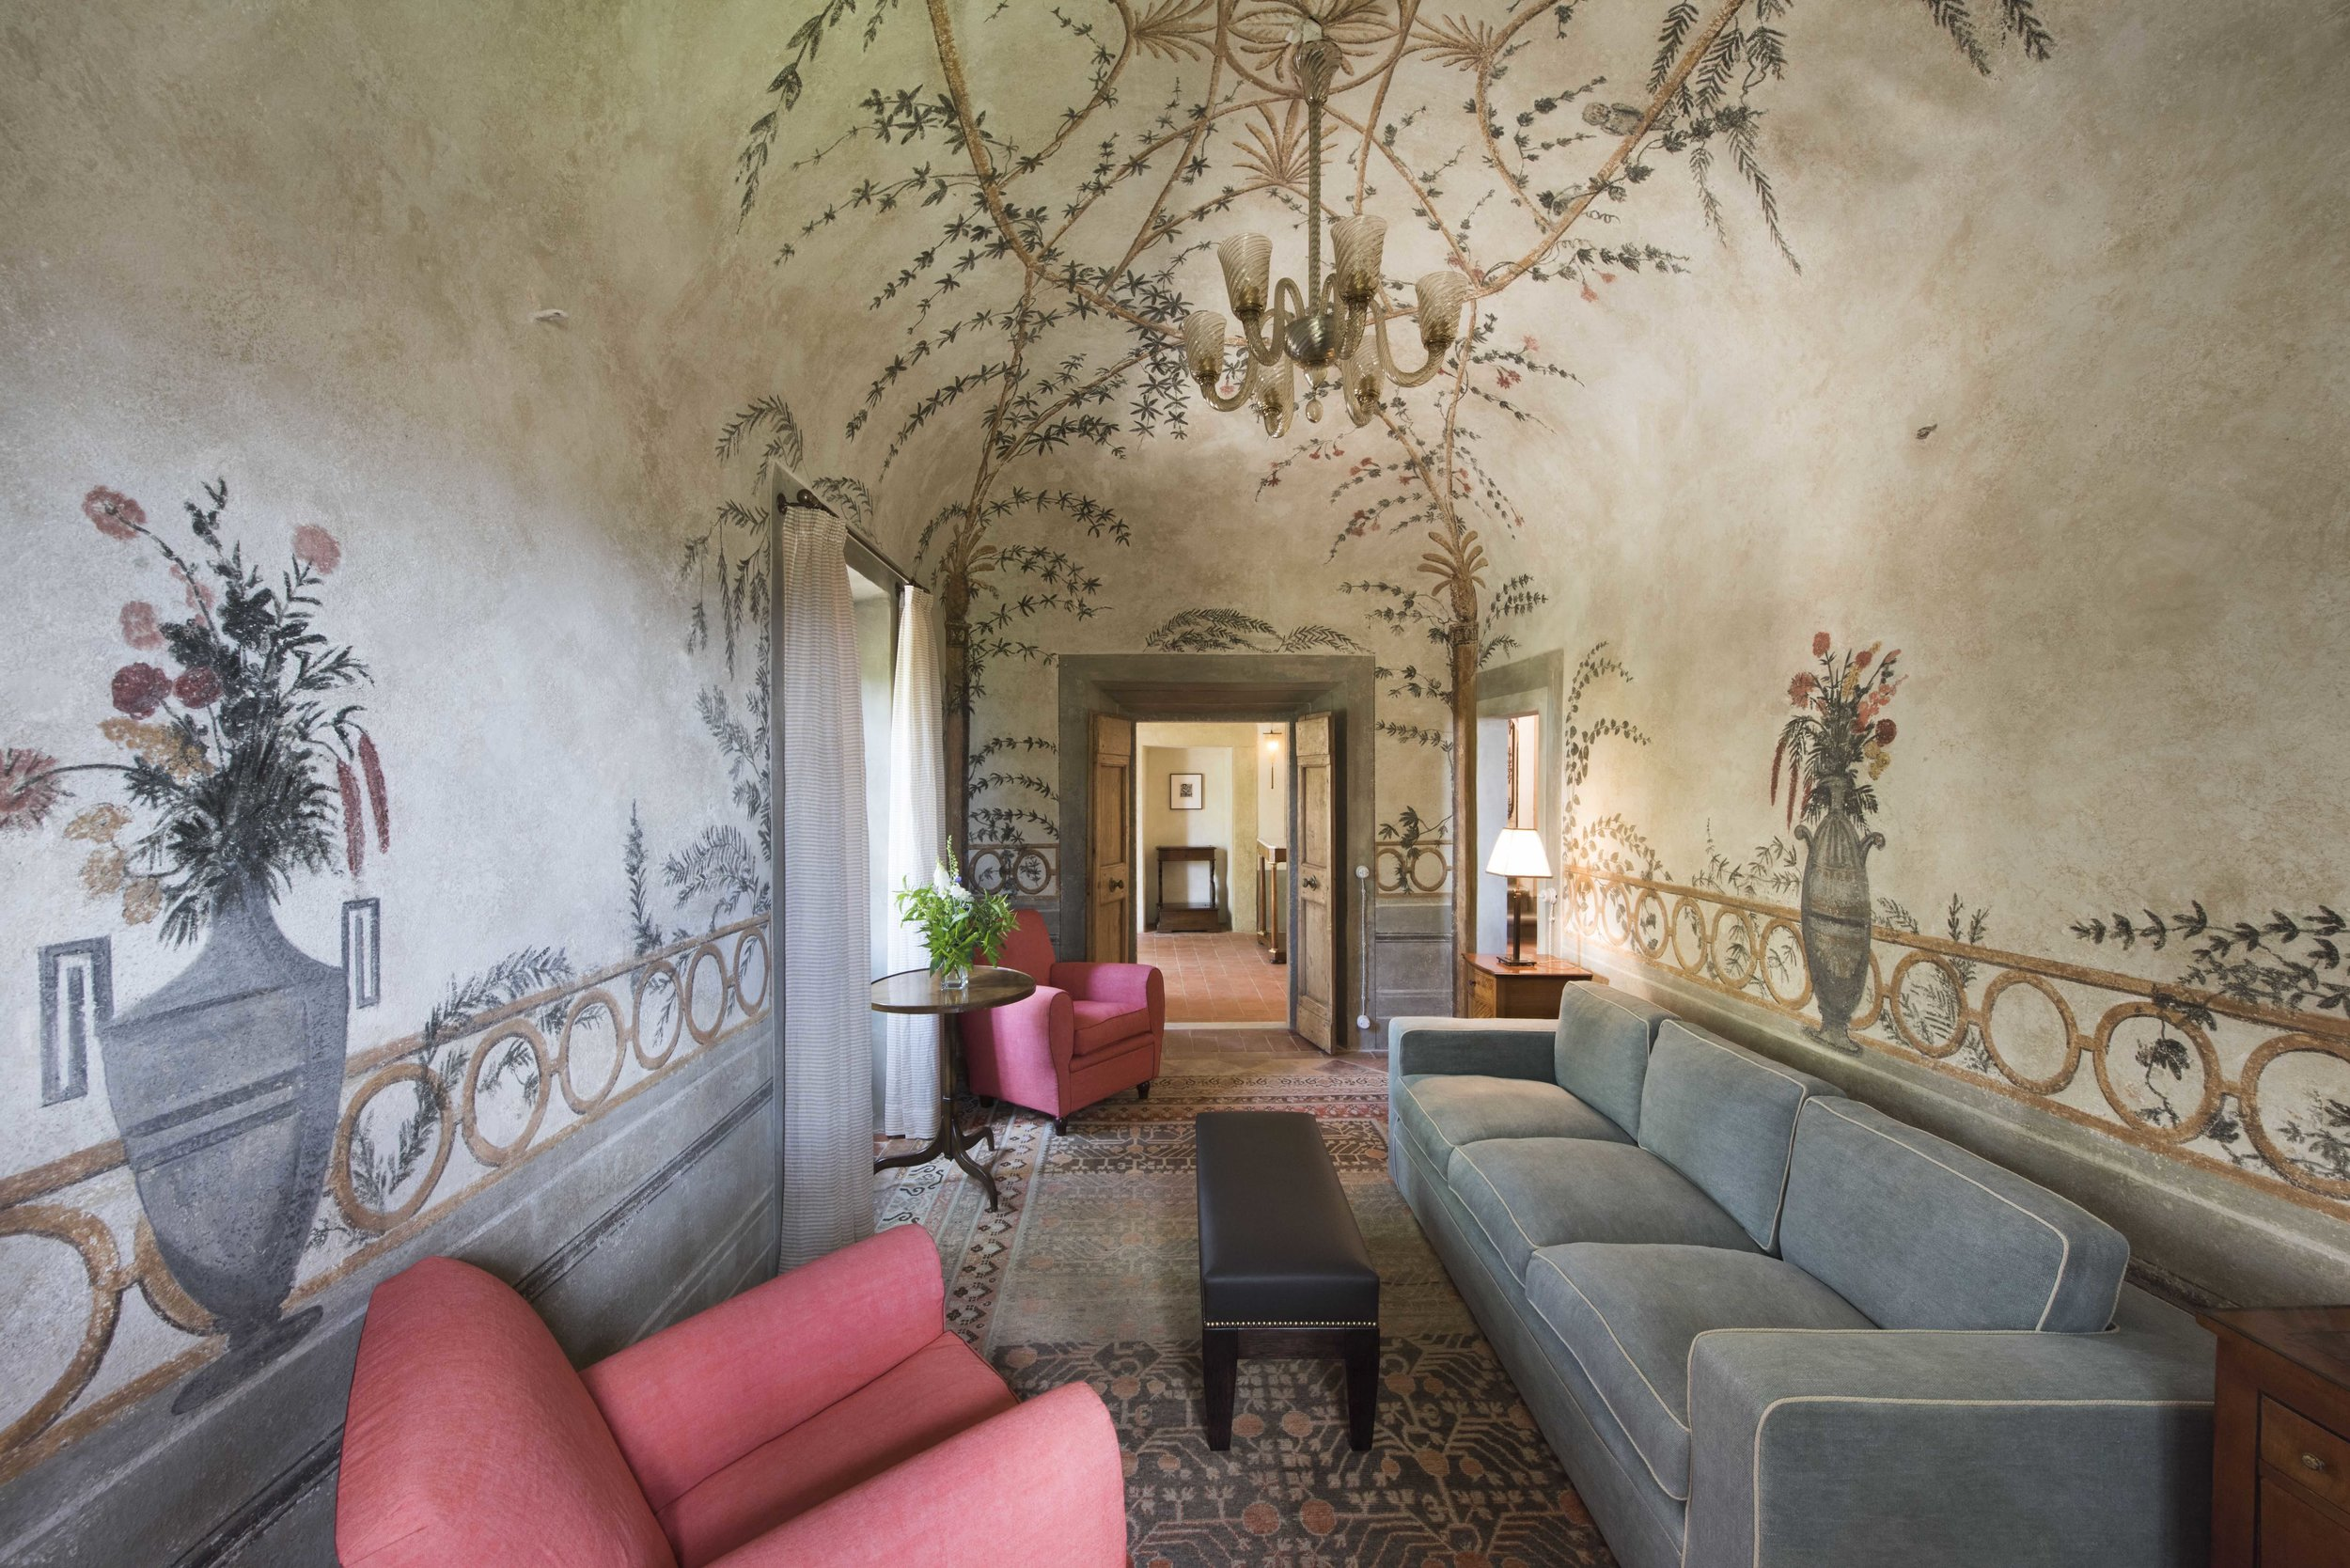 170208_pignano website photo 1.jpg